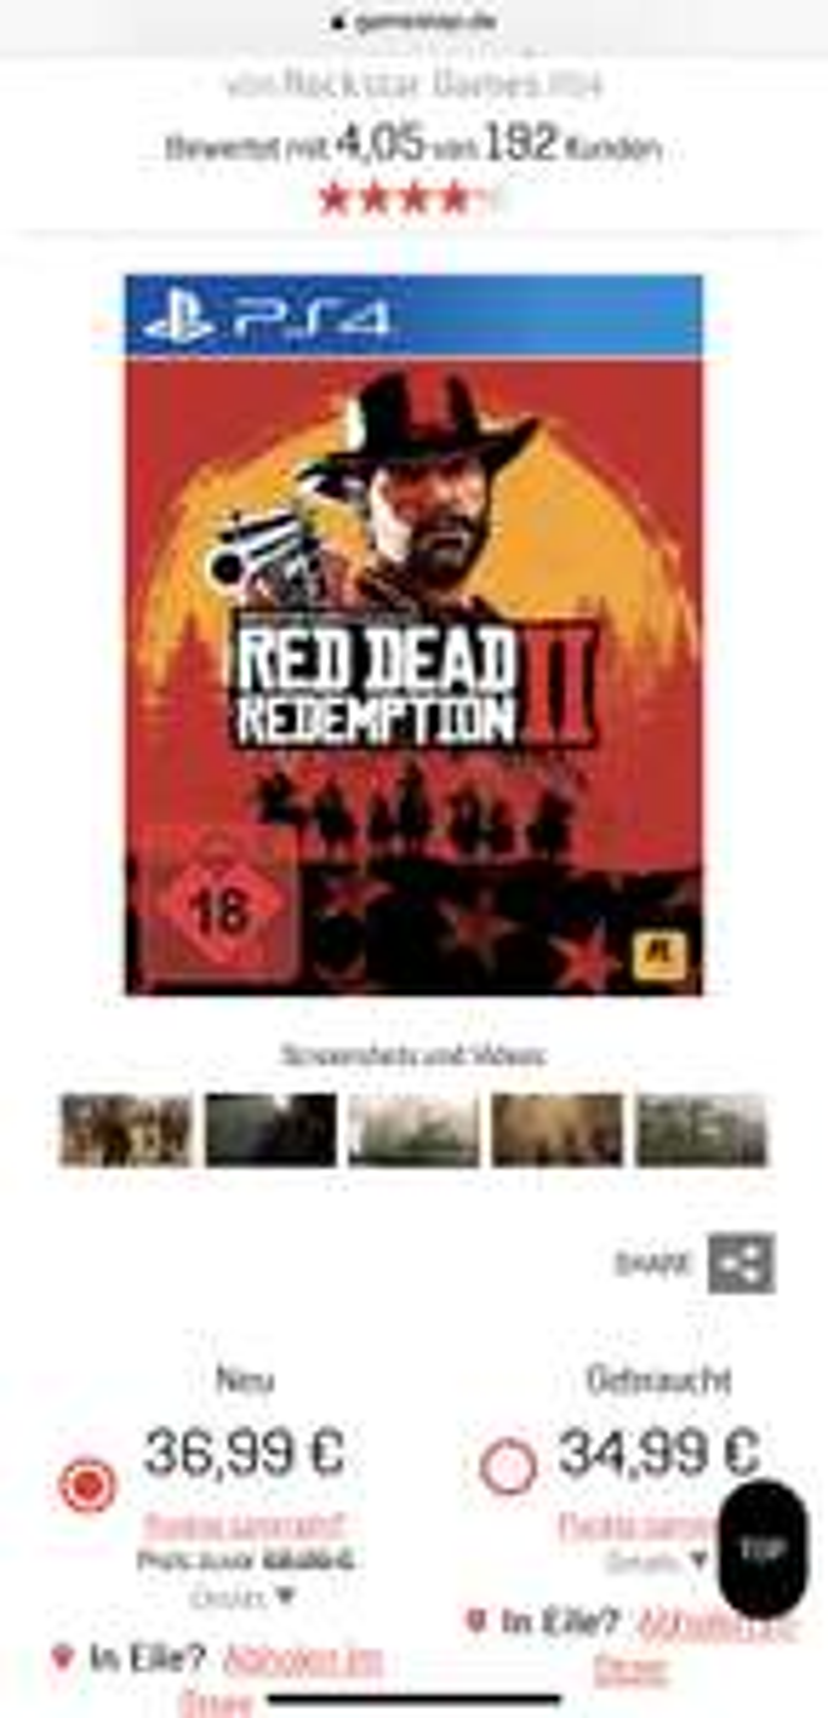 [Days of Play] Read Dead Redemption II [Gamestop lokal & online]